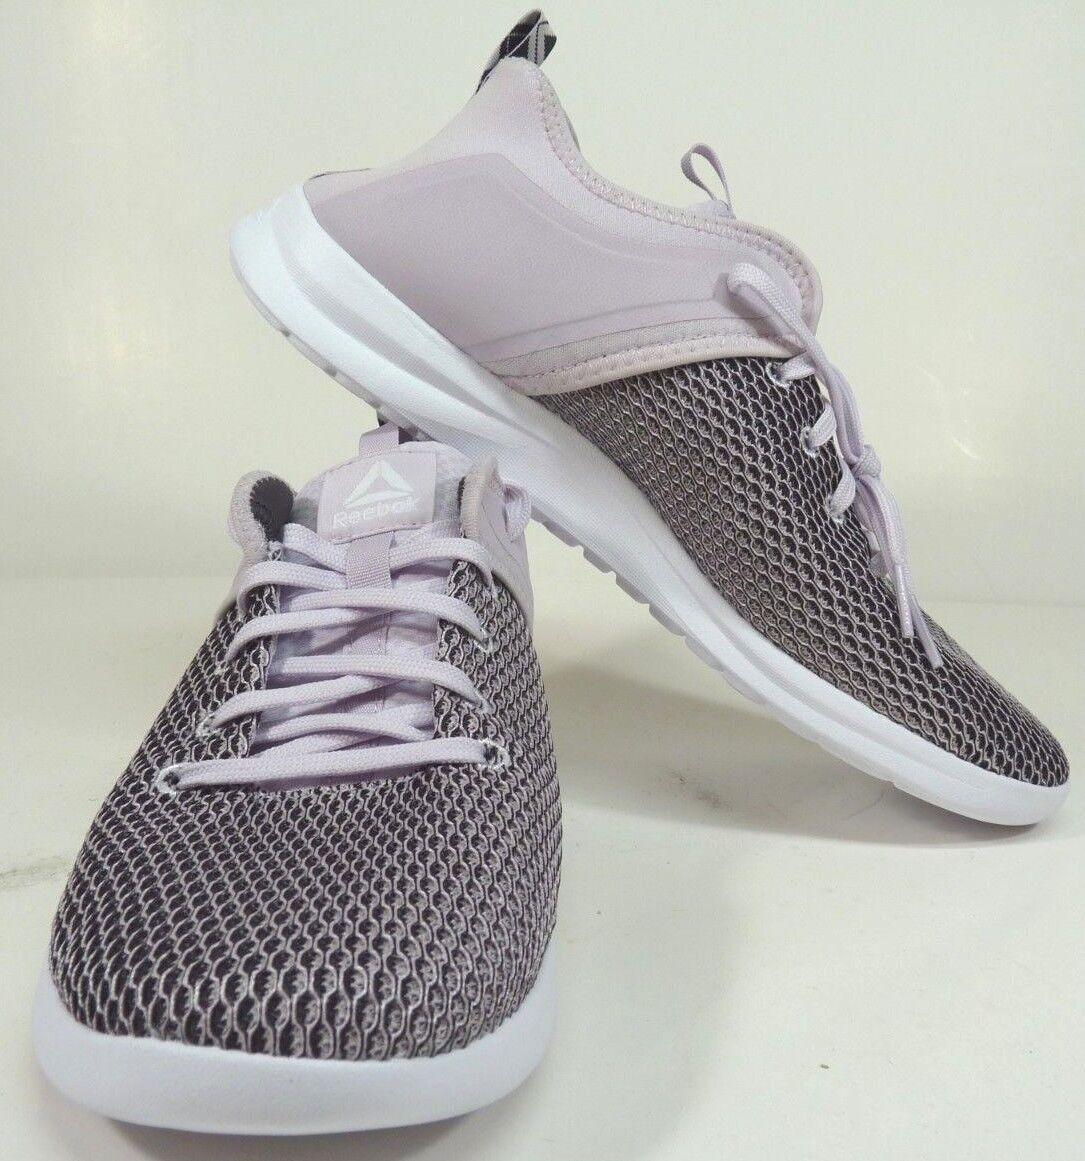 NEW Donna  Reebok Solestead BS9457 rosa Half scarpe Dimensione Dimensione Dimensione 9 39124a